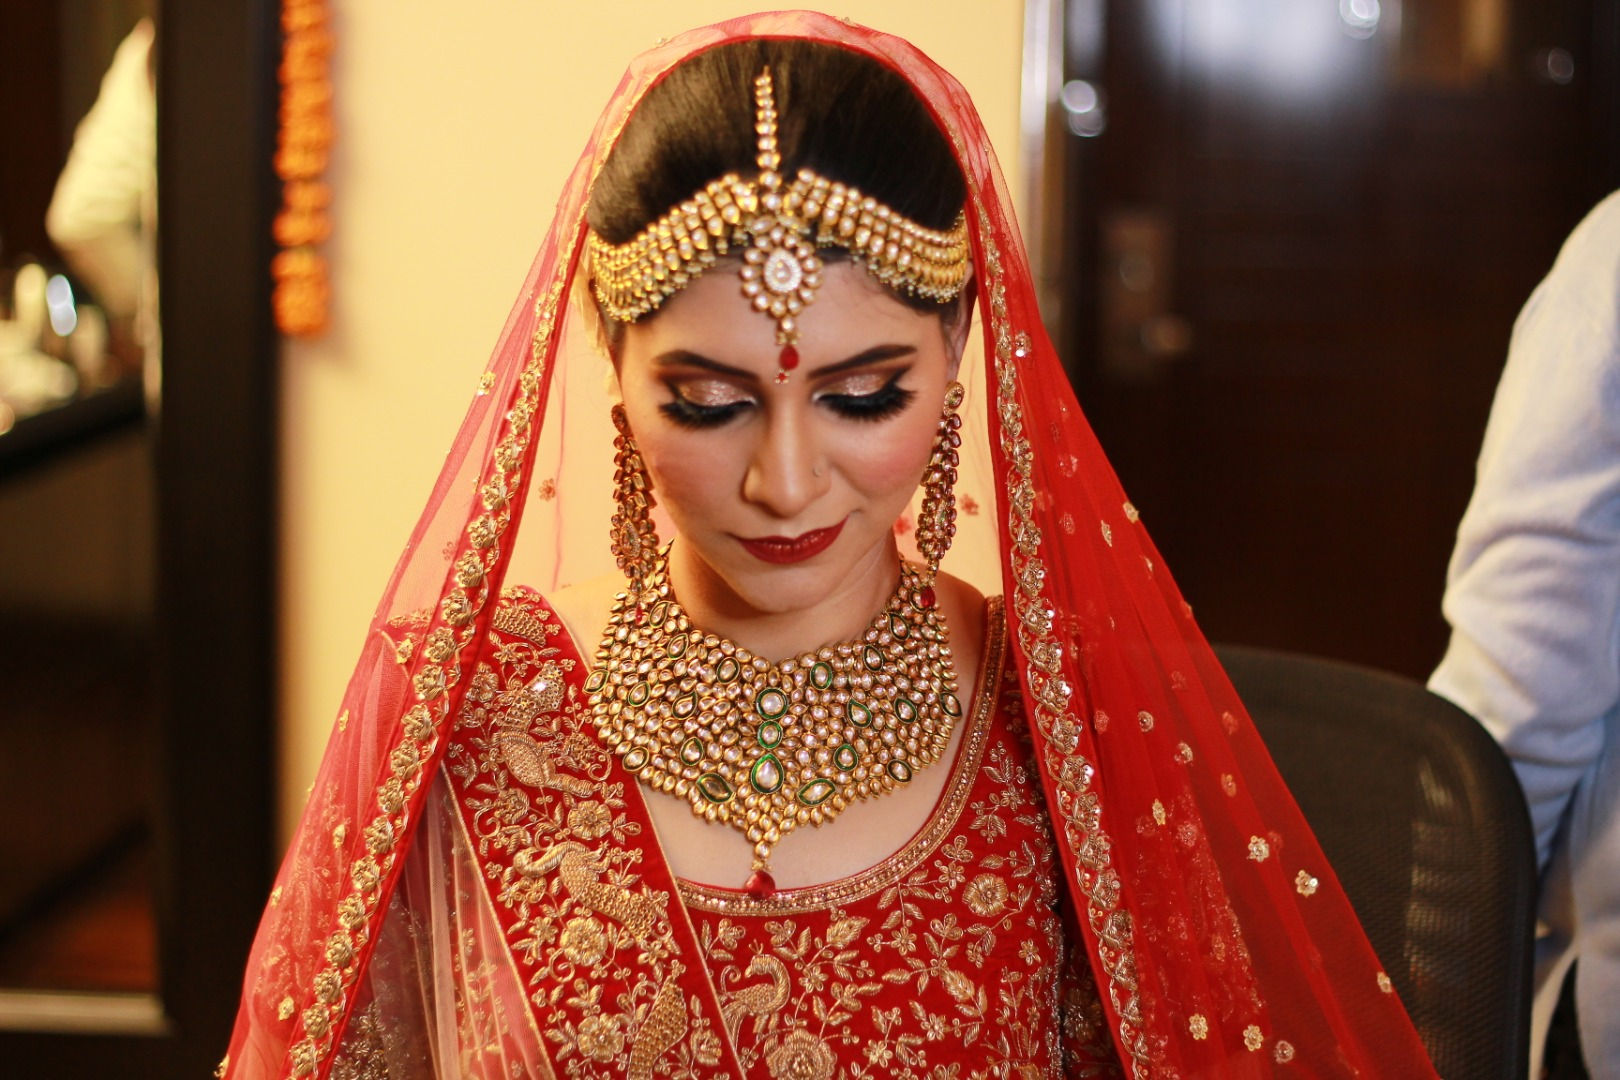 Beautiful bride in orange lehenga and golden jewelry